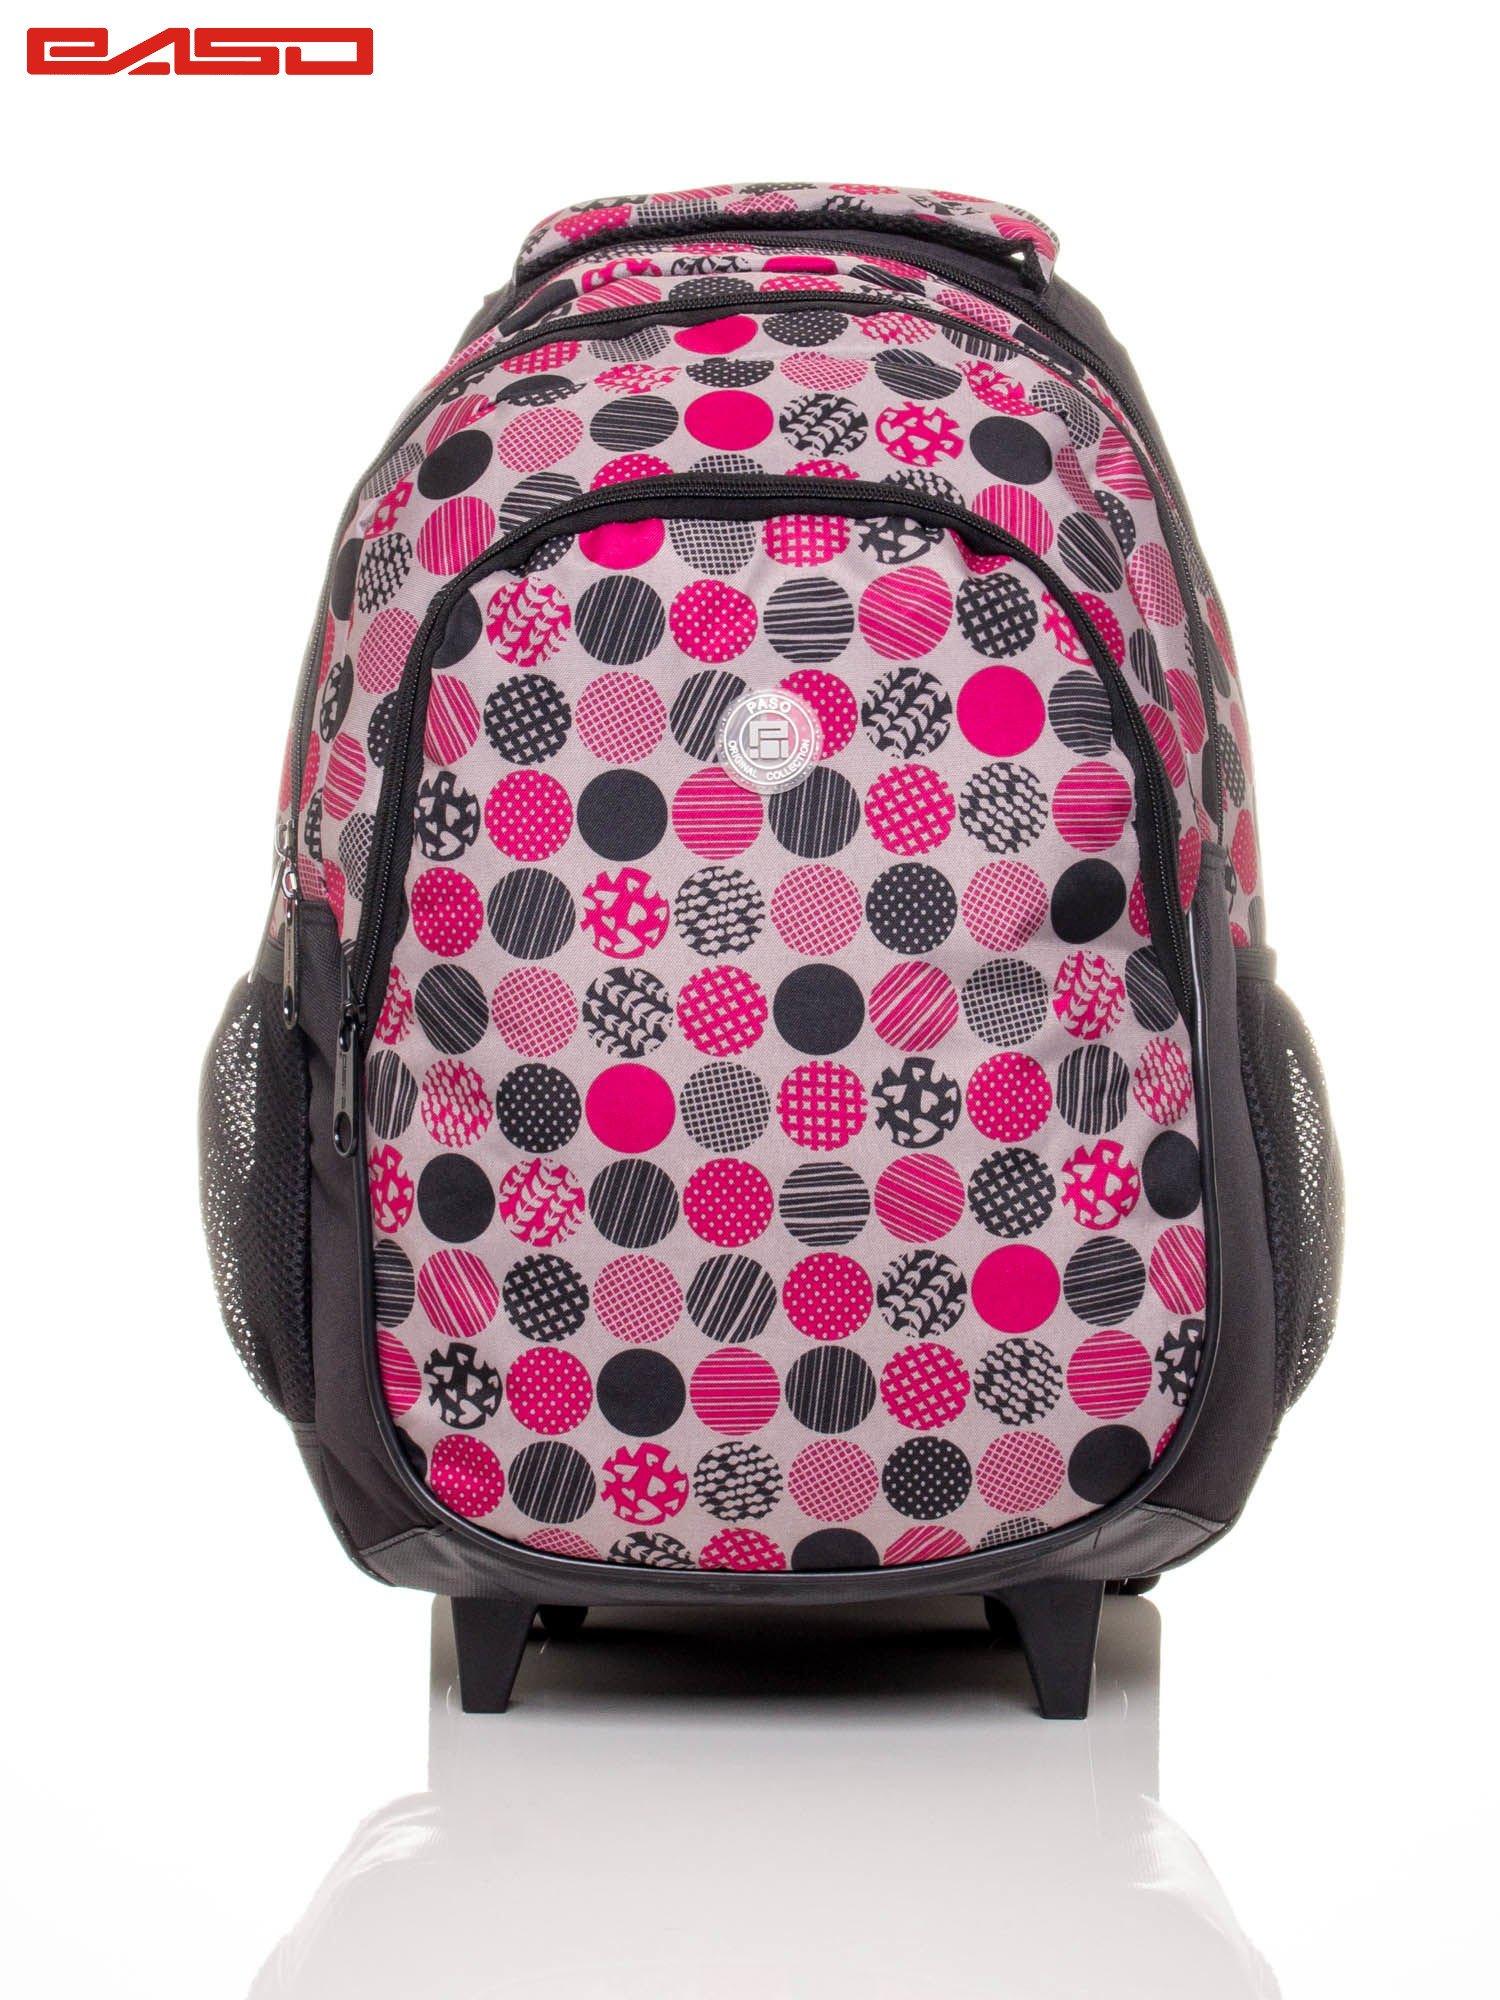 1ee6f2d3d815d GRATIS!!! Plecak szkolny na kółkach z kolorowym nadrukiem - Dziecko ...